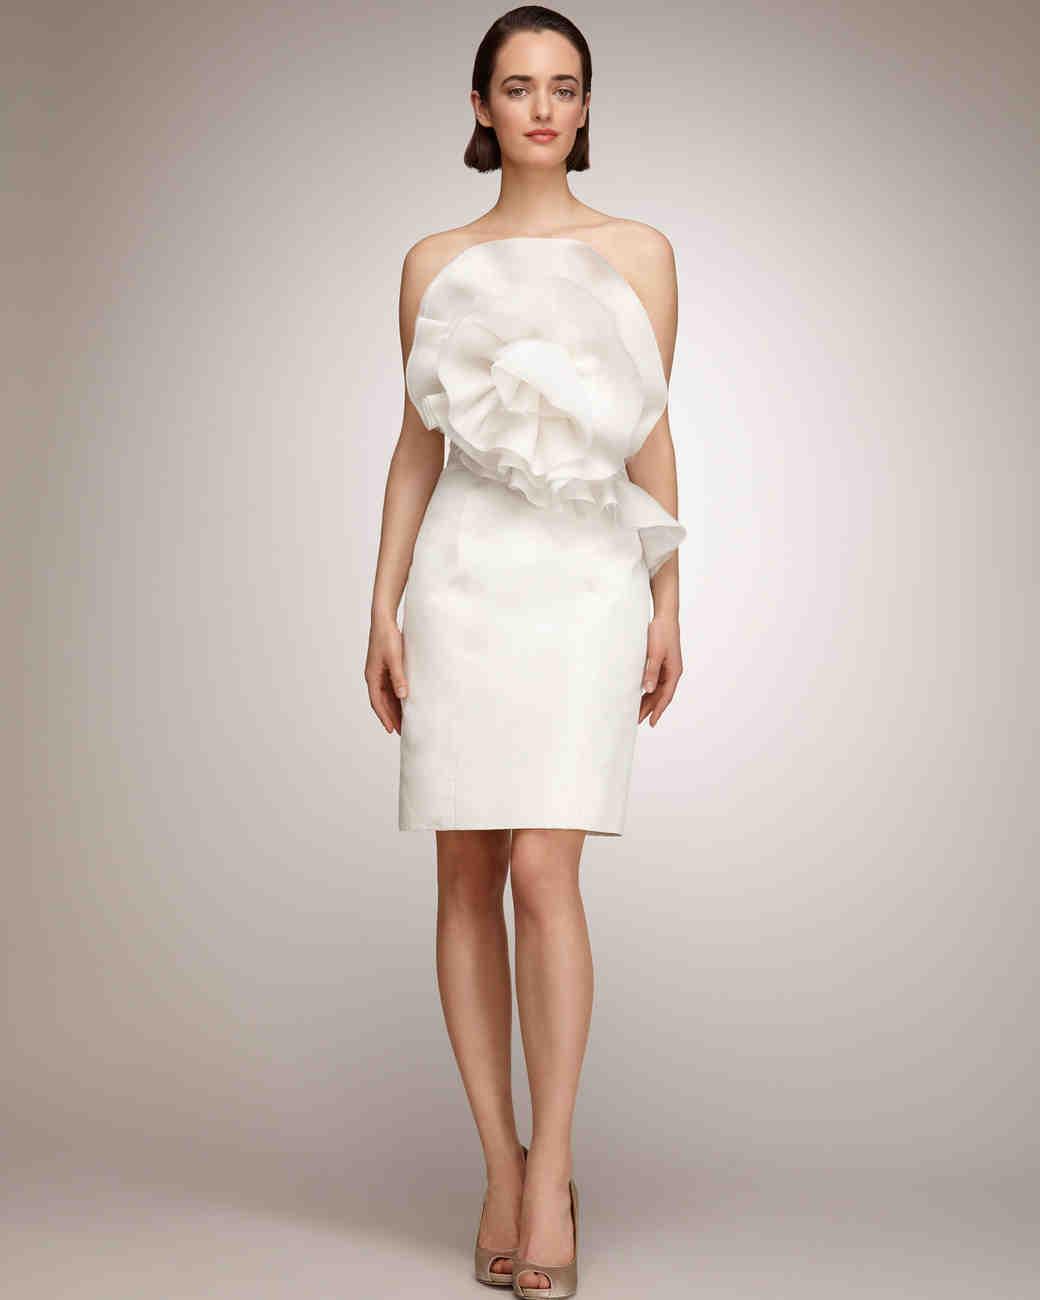 issac-mizrahi-gowns-0611wd8.jpg